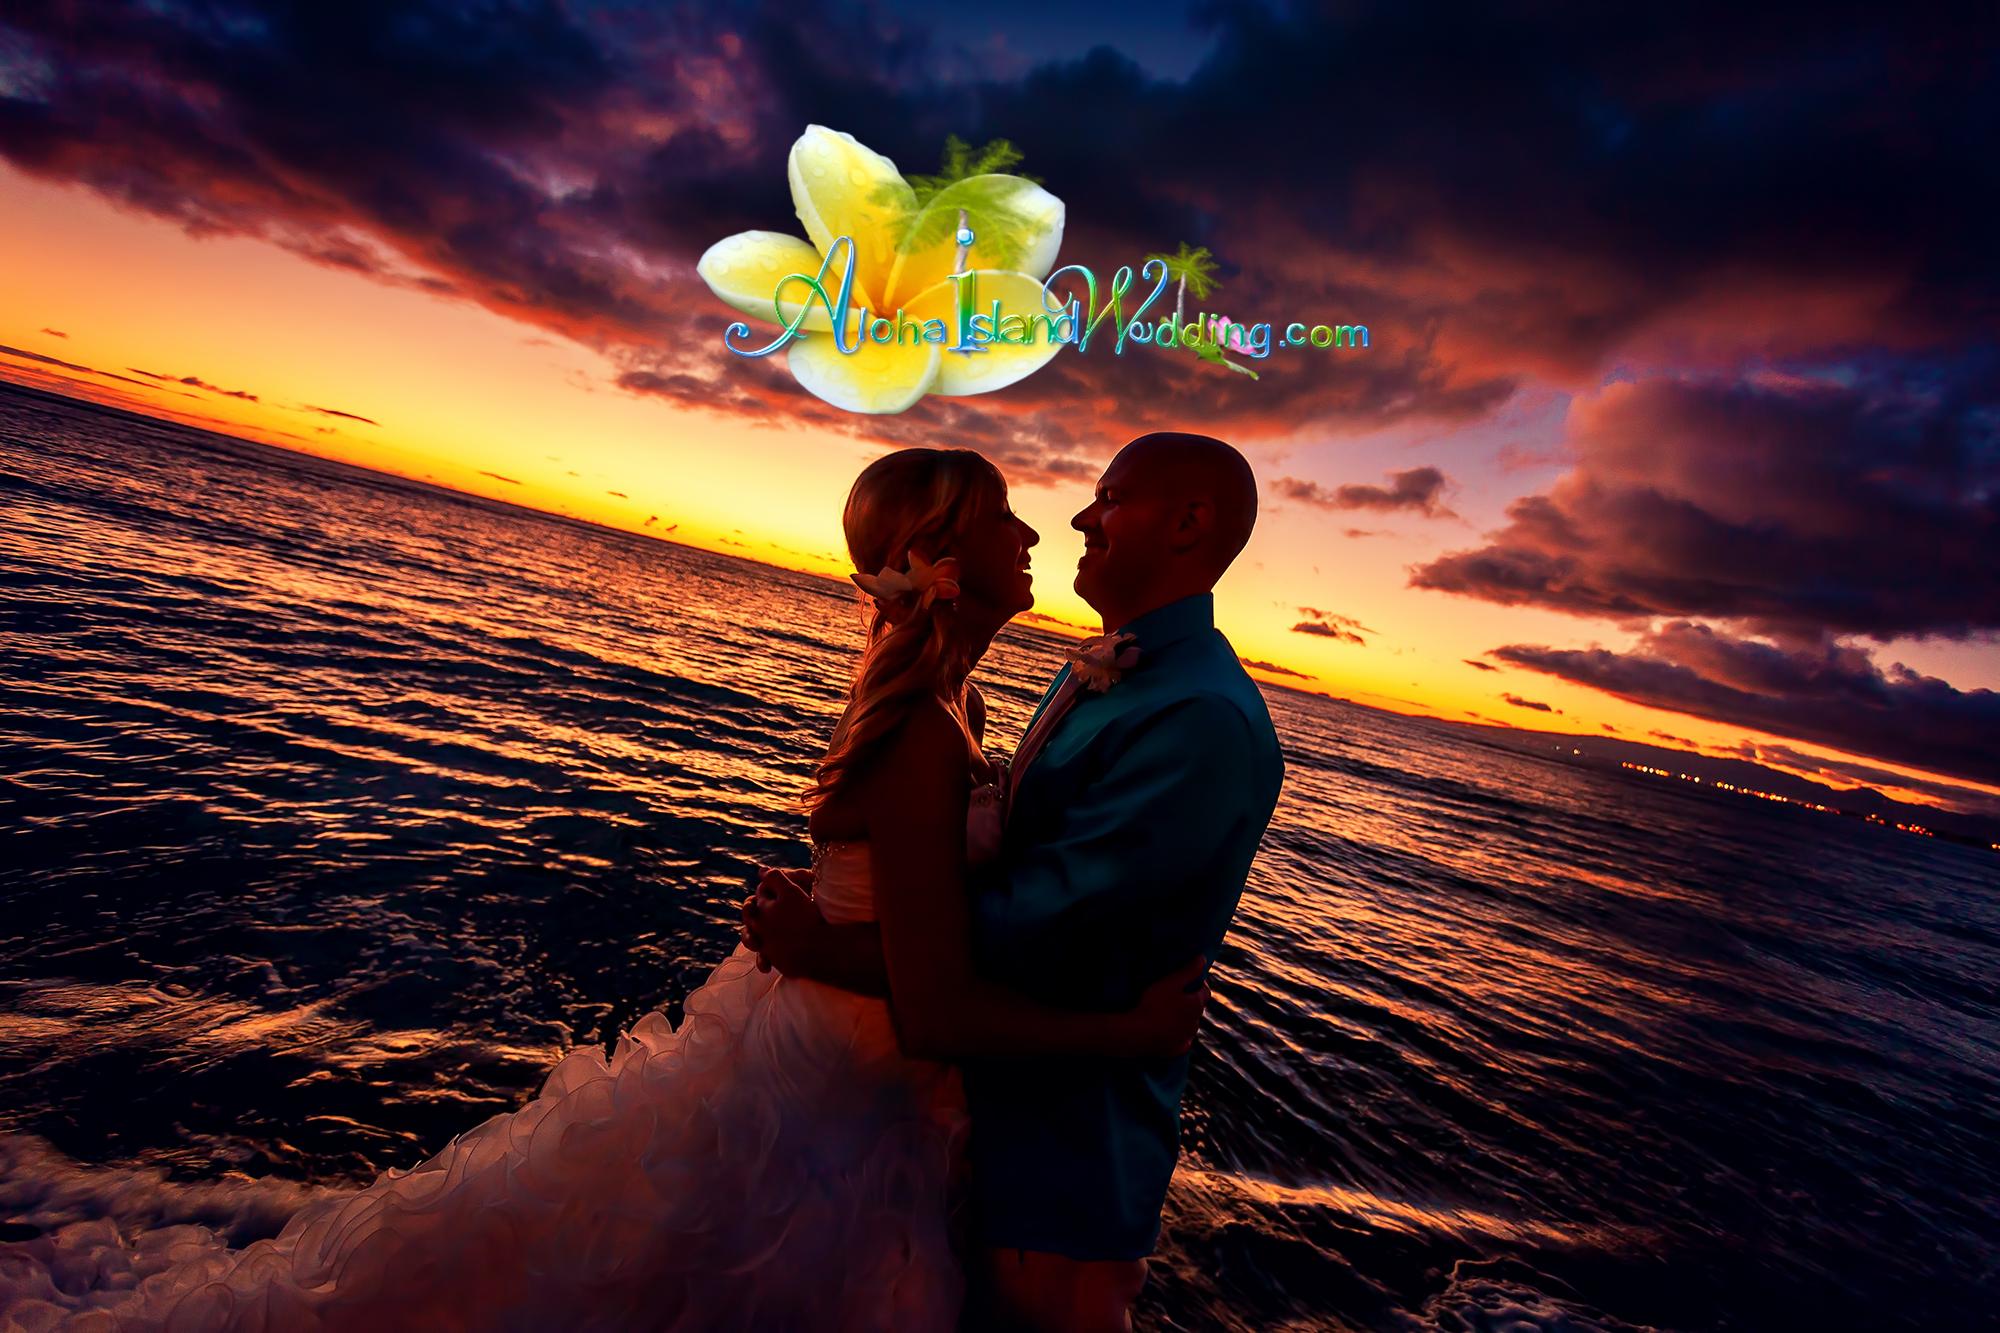 Hawaii wedding sunset on the beach -